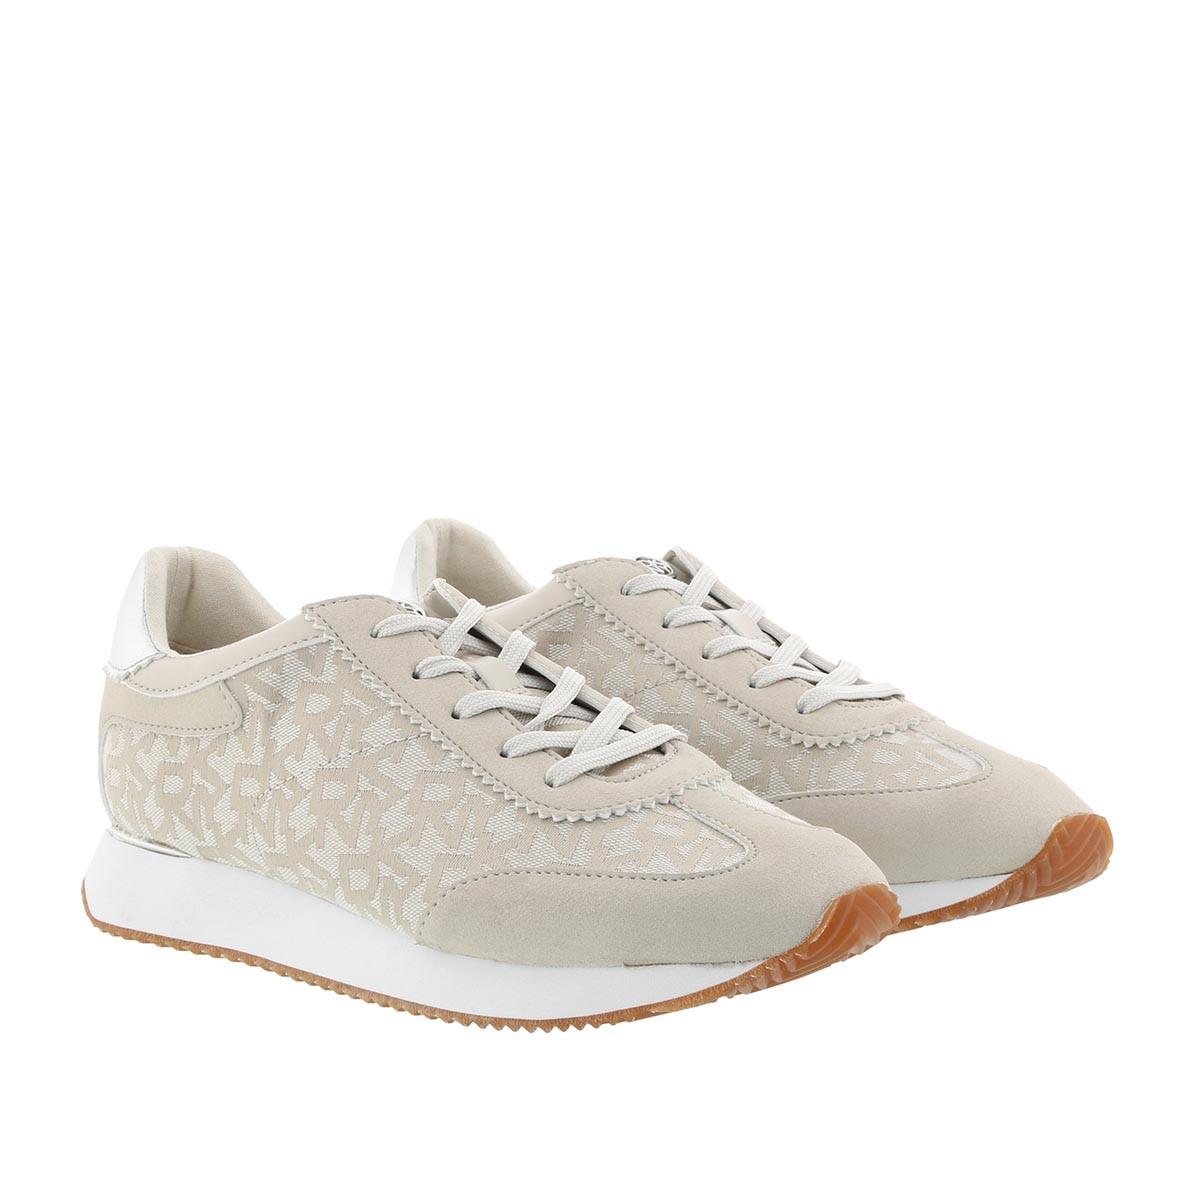 DKNY Sneakers - Arlie Slip On Sneaker Hemp - in beige - für Damen